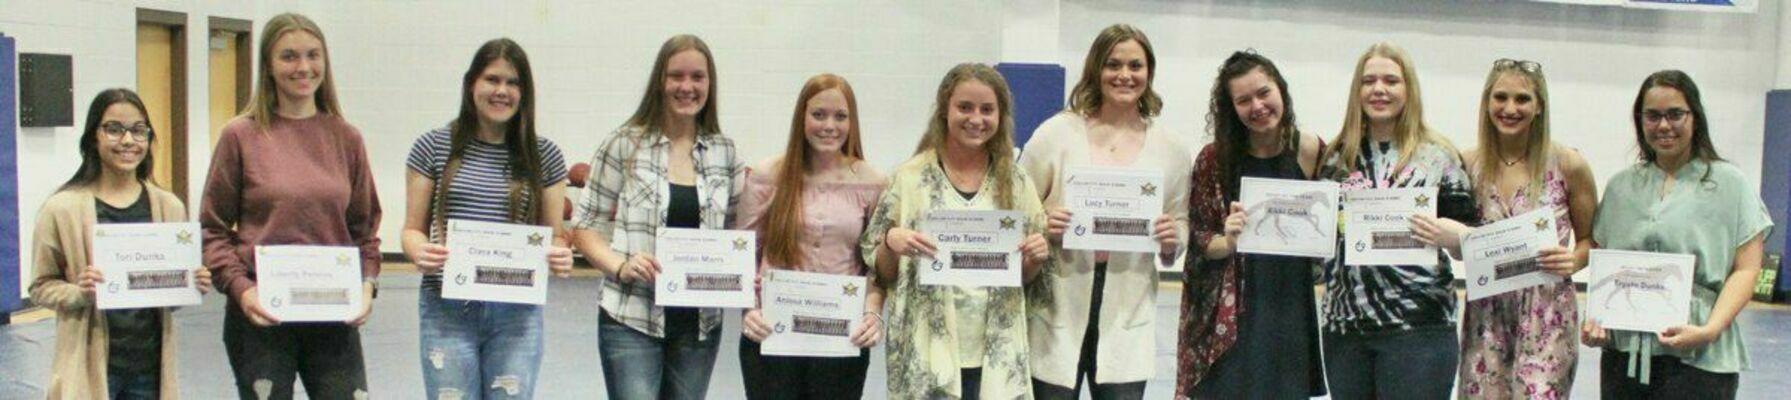 Varsity Softball Team - from left; Tori Dunks, Liberty Perkins, Ciara King, Jordan Marrs, Anissa Williams, Carly Turner, Lucy Turner, Destiny Gutshall, Rikki Cook, Lexi Wyant and Trystn Dunks.